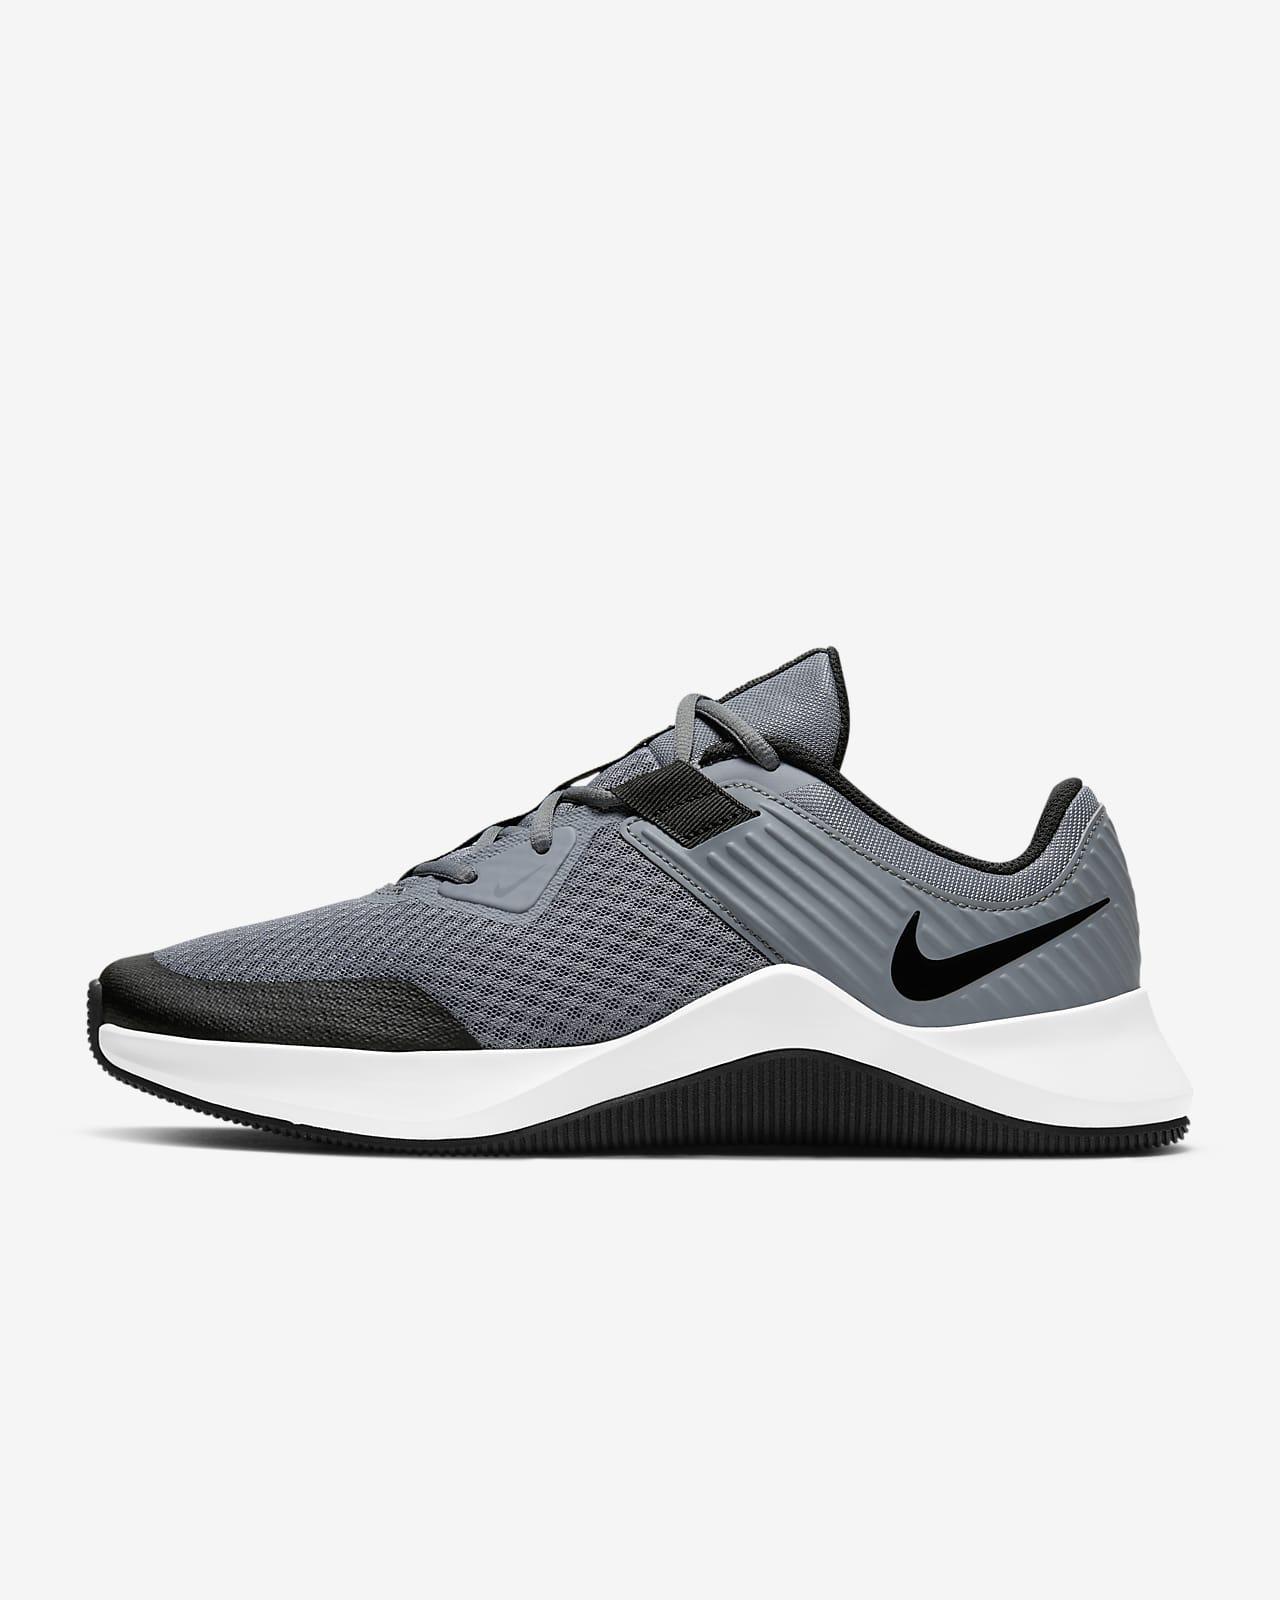 Comunista personalidad Oferta  Nike MC Trainer Men's Training Shoe. Nike LU